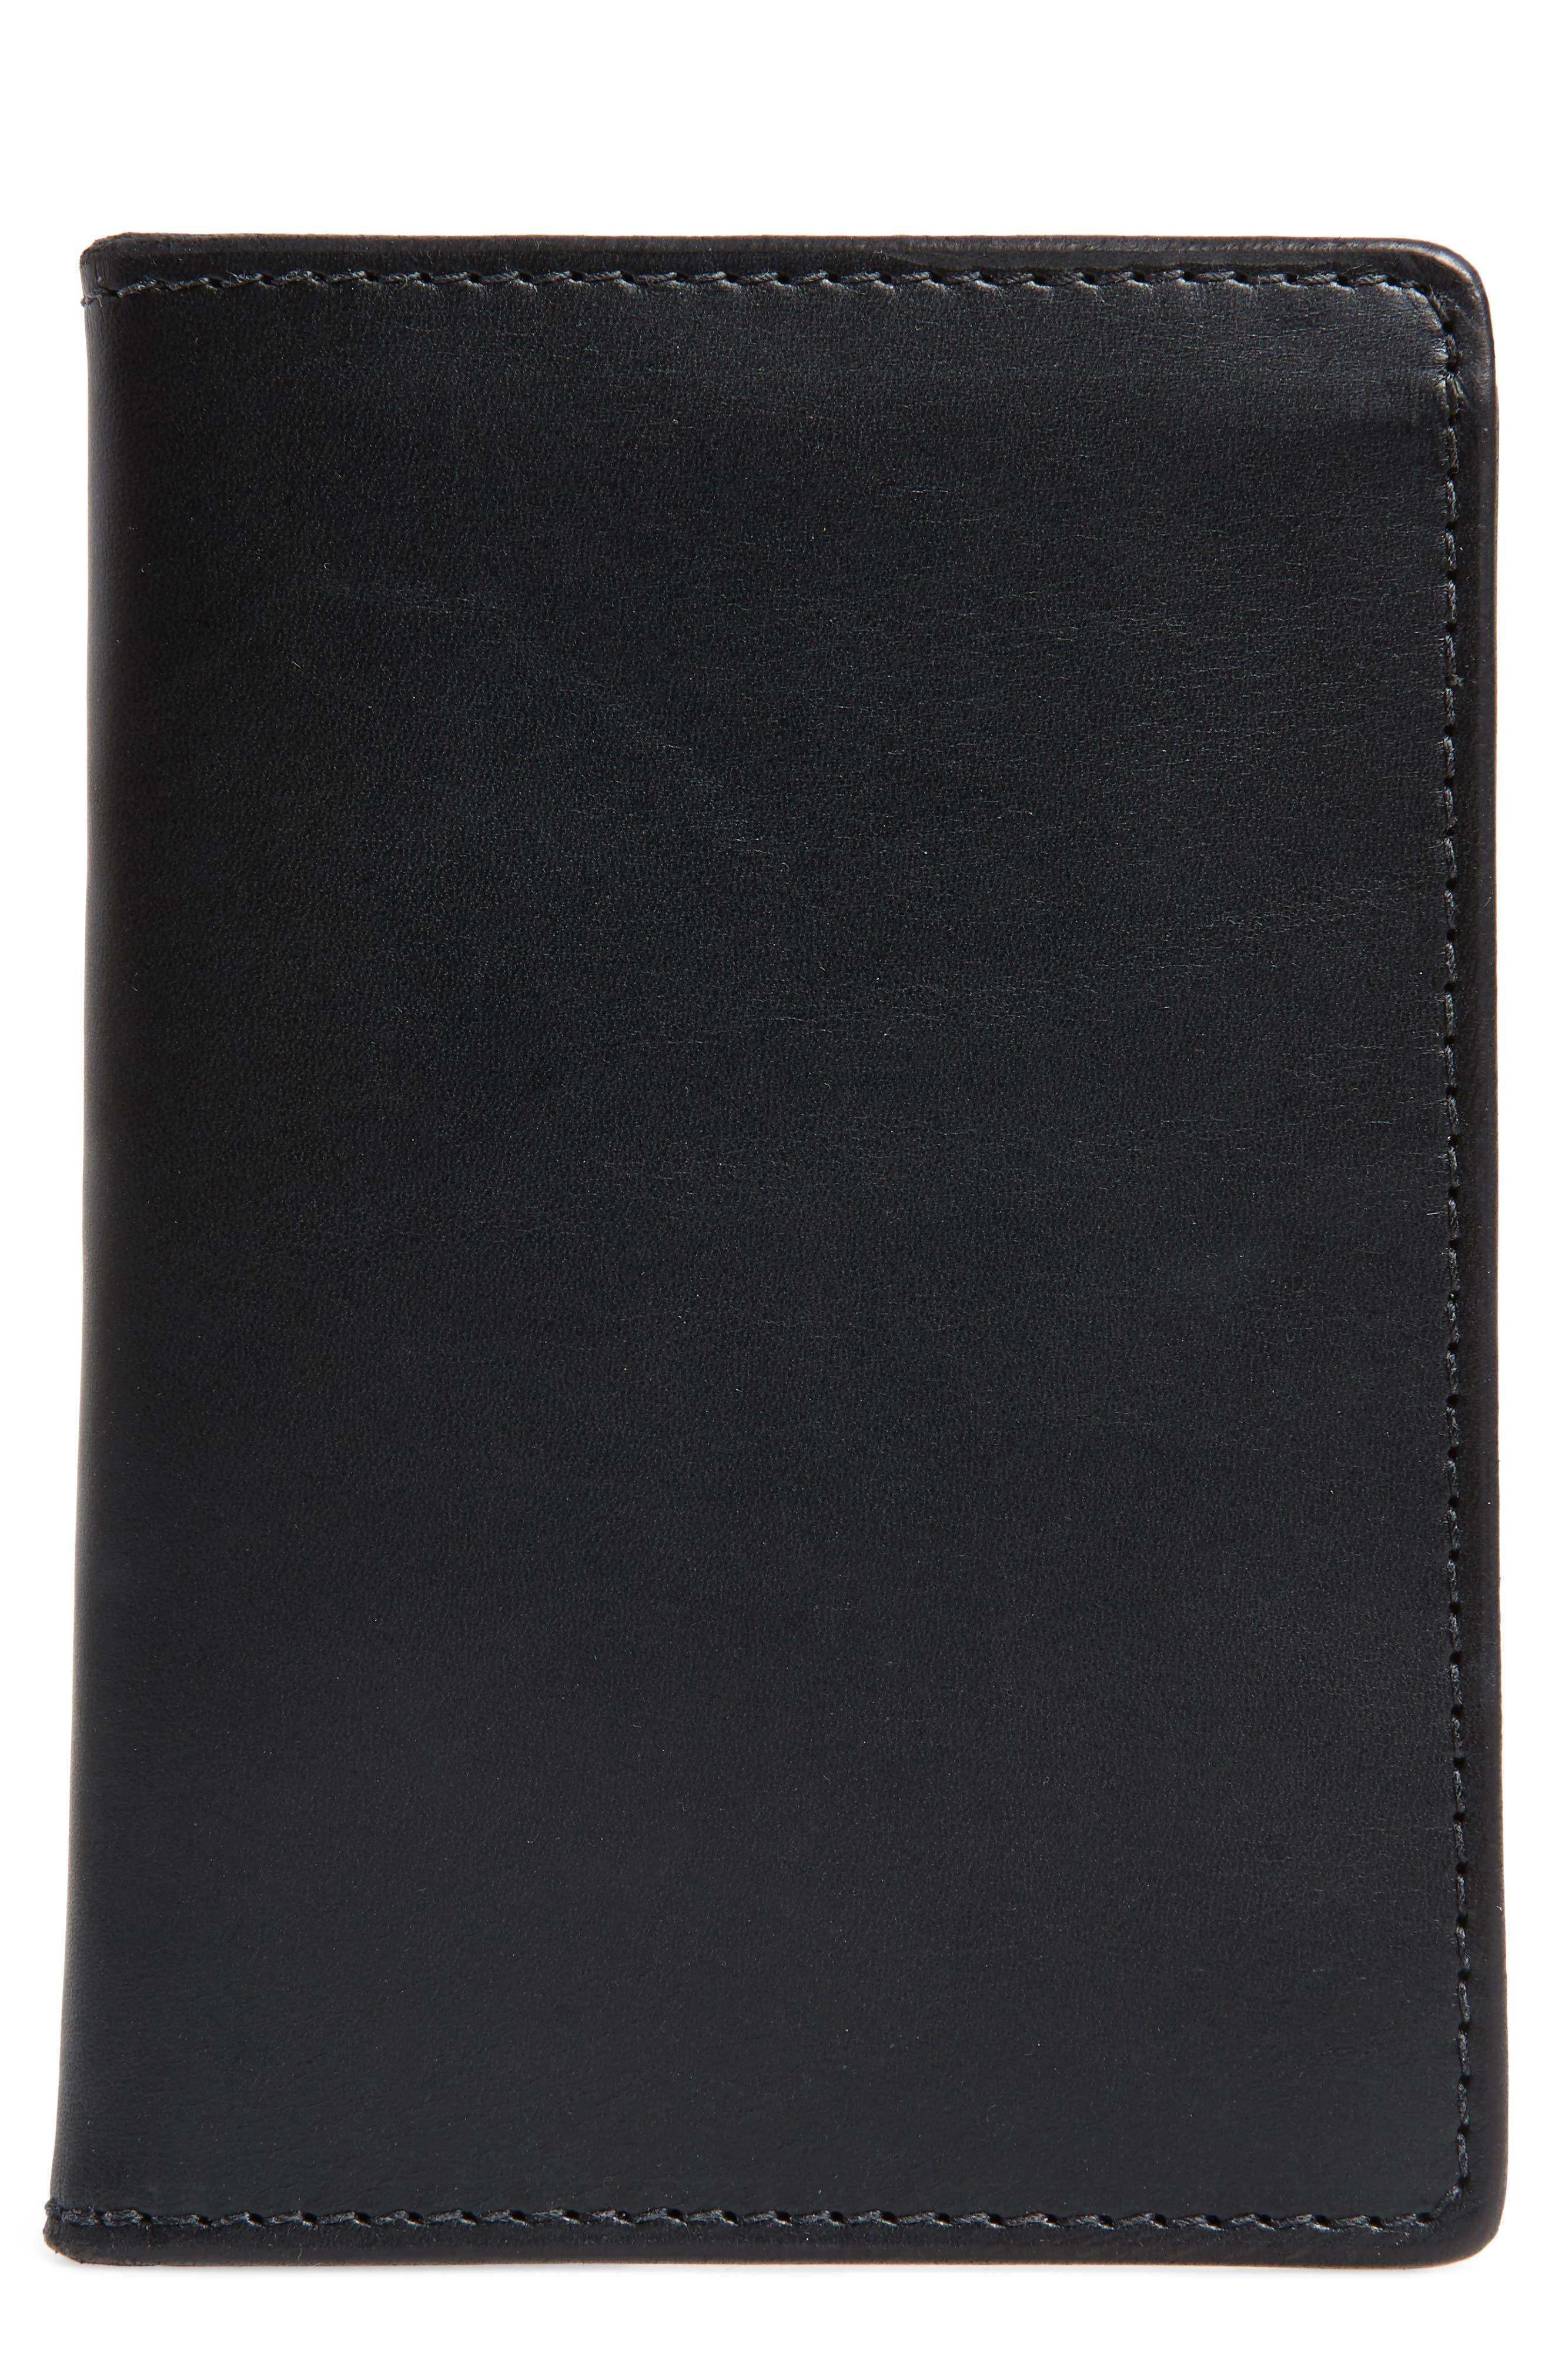 Leather Travel Wallet,                             Main thumbnail 1, color,                             Black